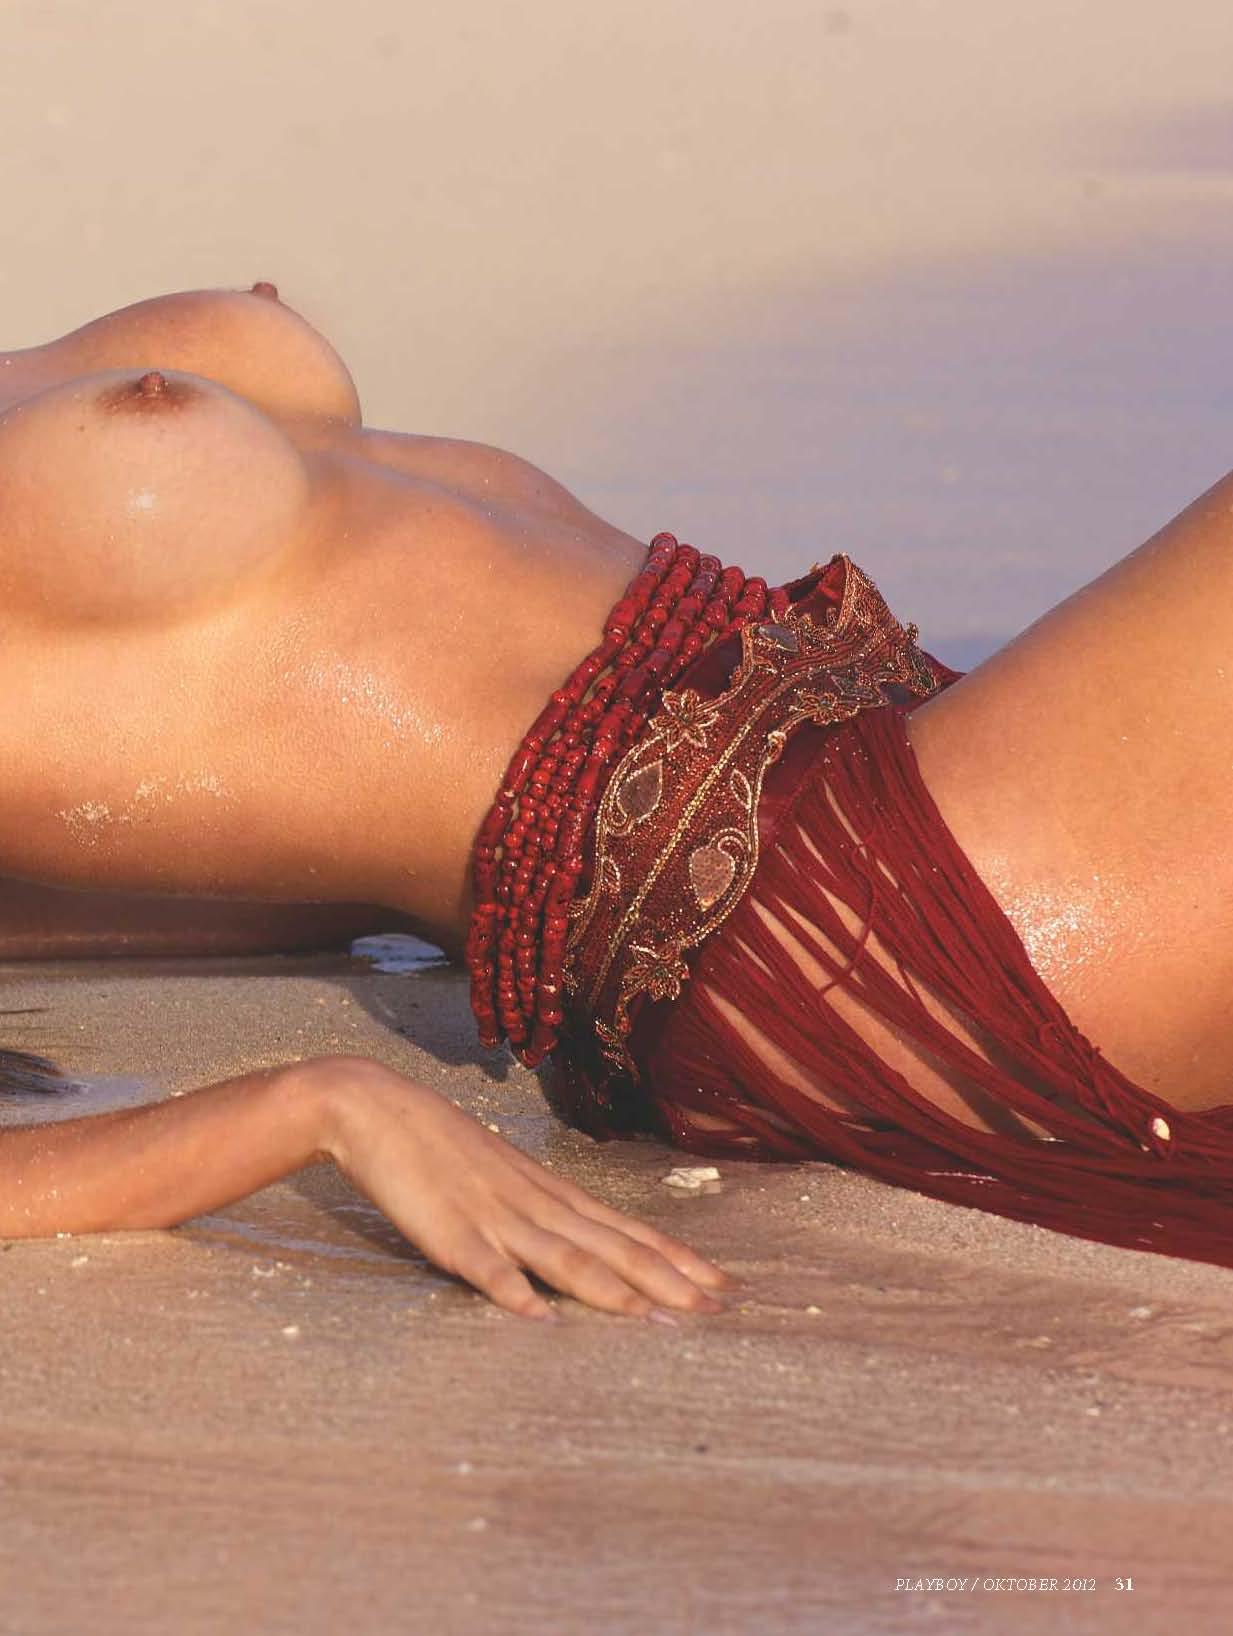 23063_septimiu29_RosannaDavison_PlayboyGermany_Oct20123_123_514lo.jpg